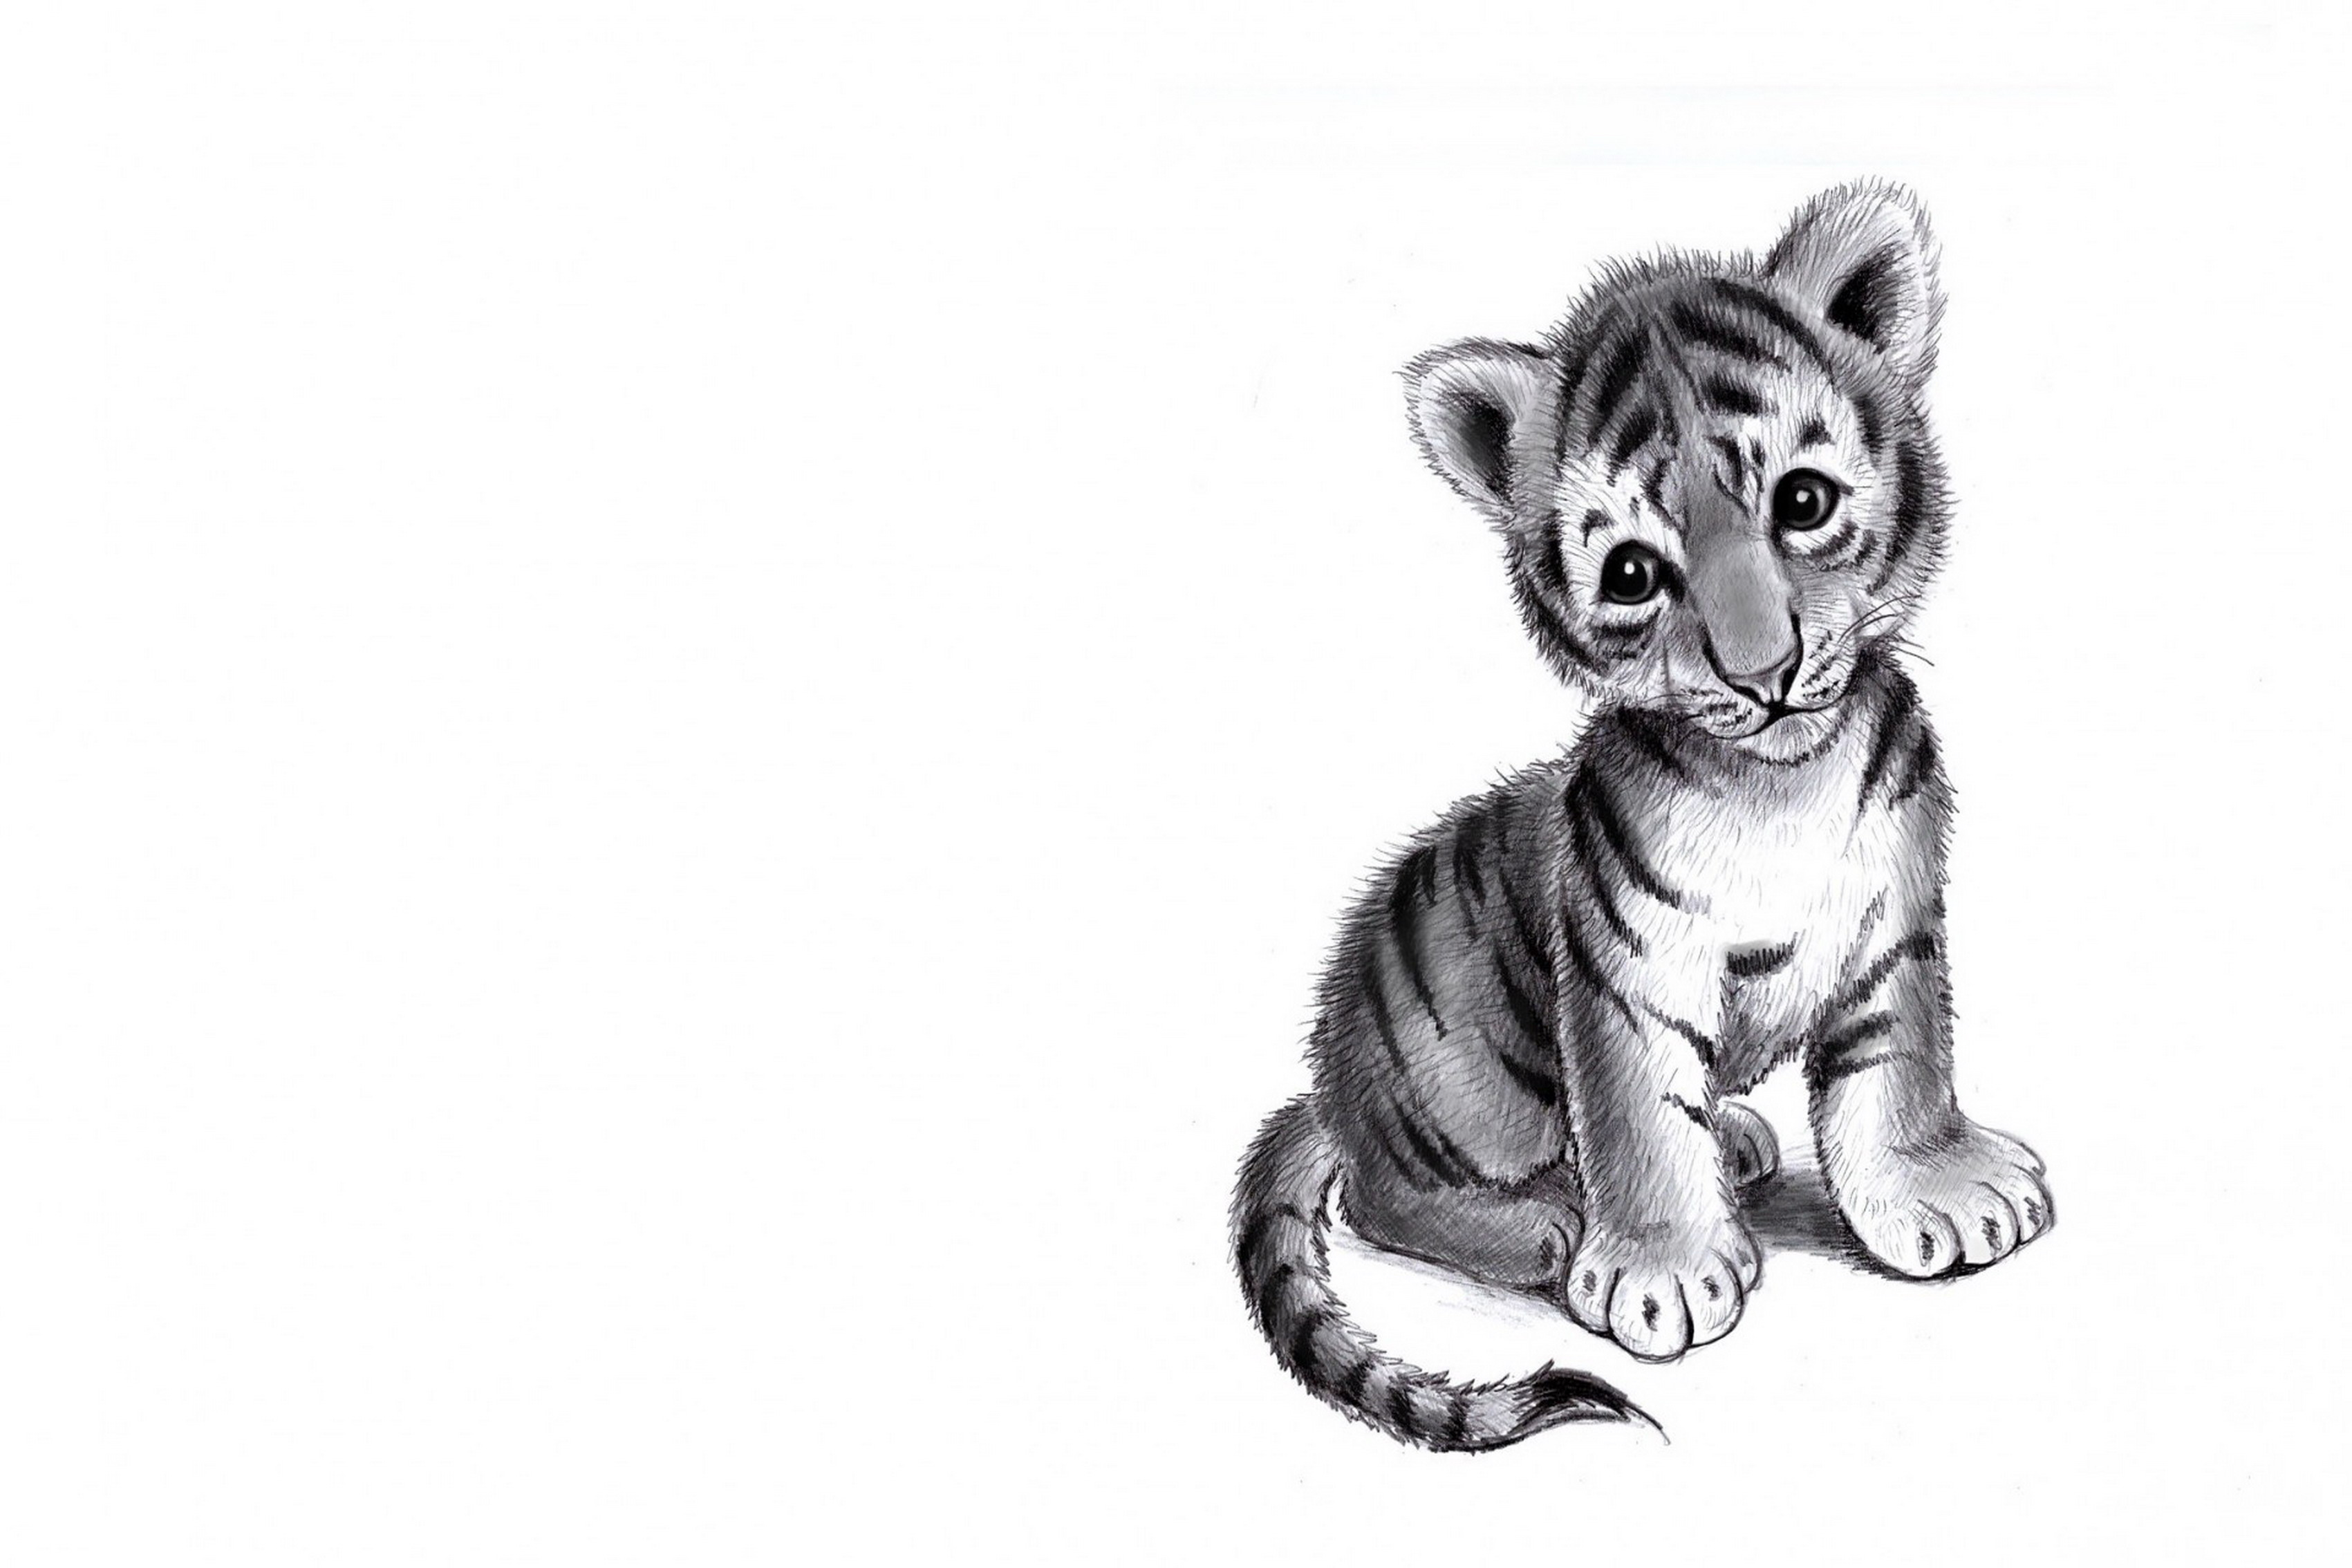 B b tigre crayon dessin triste humeur salon accueil art d cor bois cadre tissu affiche - Dessin triste ...